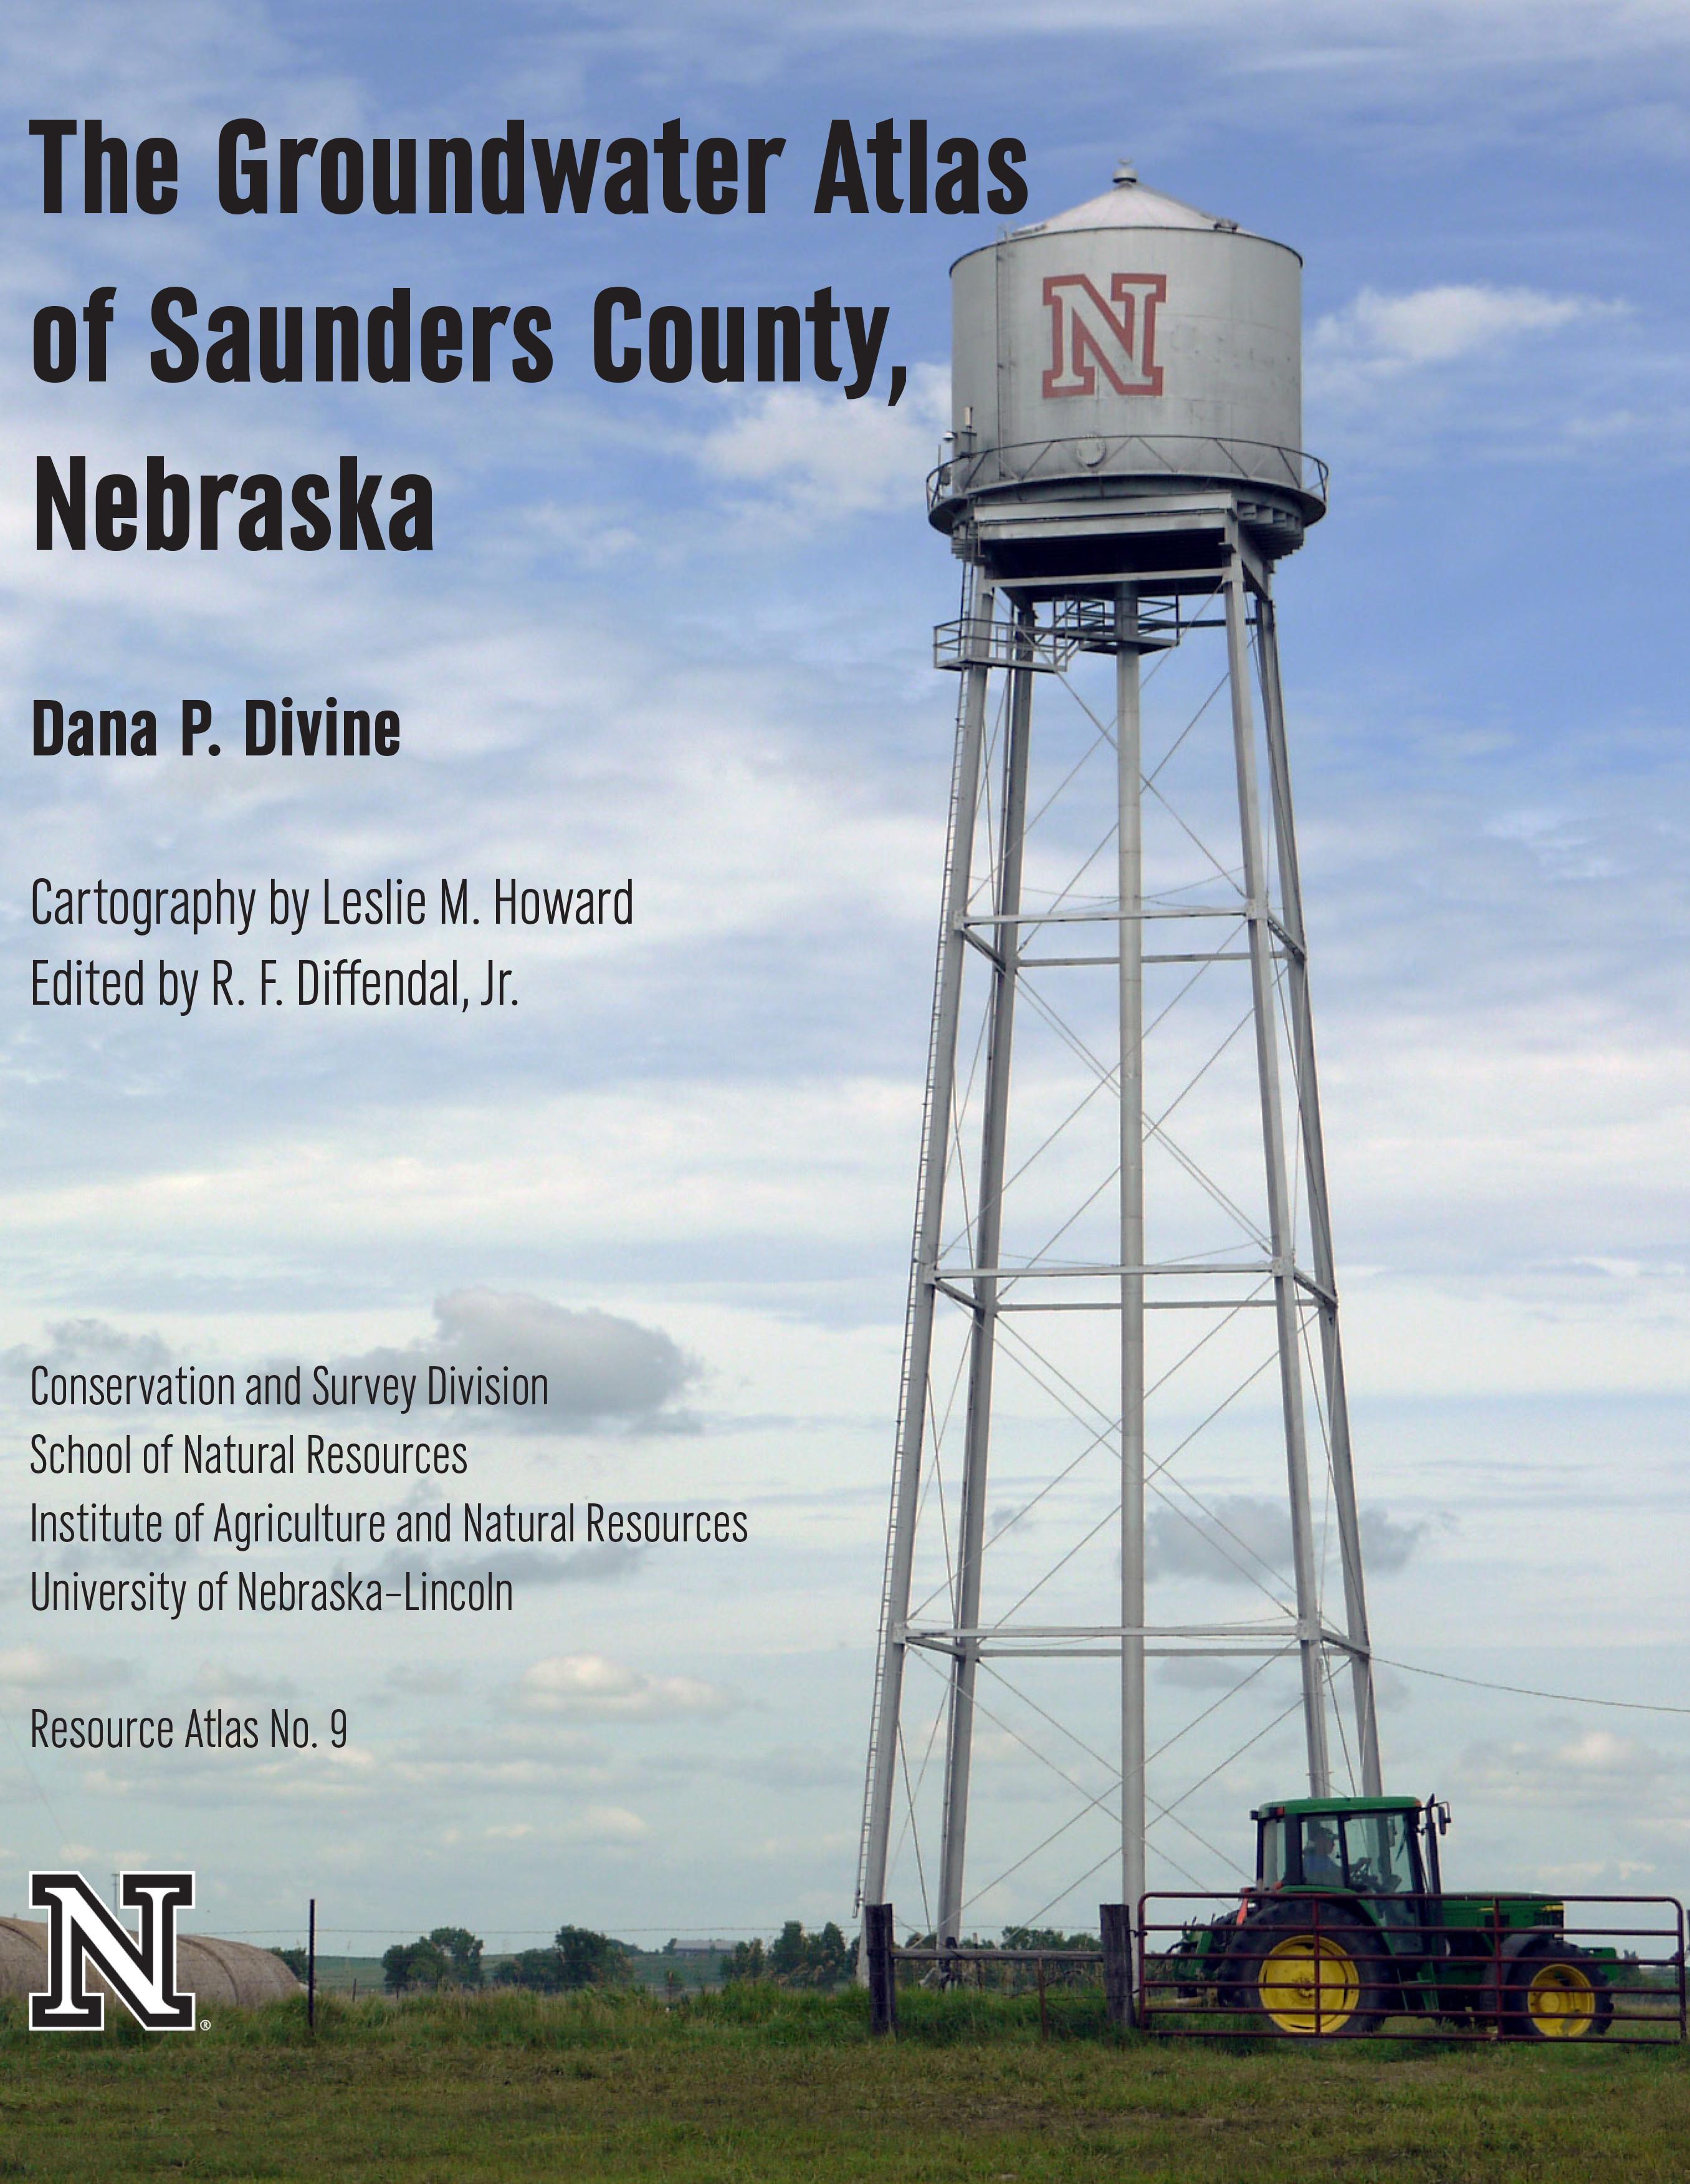 The Groundwater Atlas of Saunders County, Nebraska (RA-9)